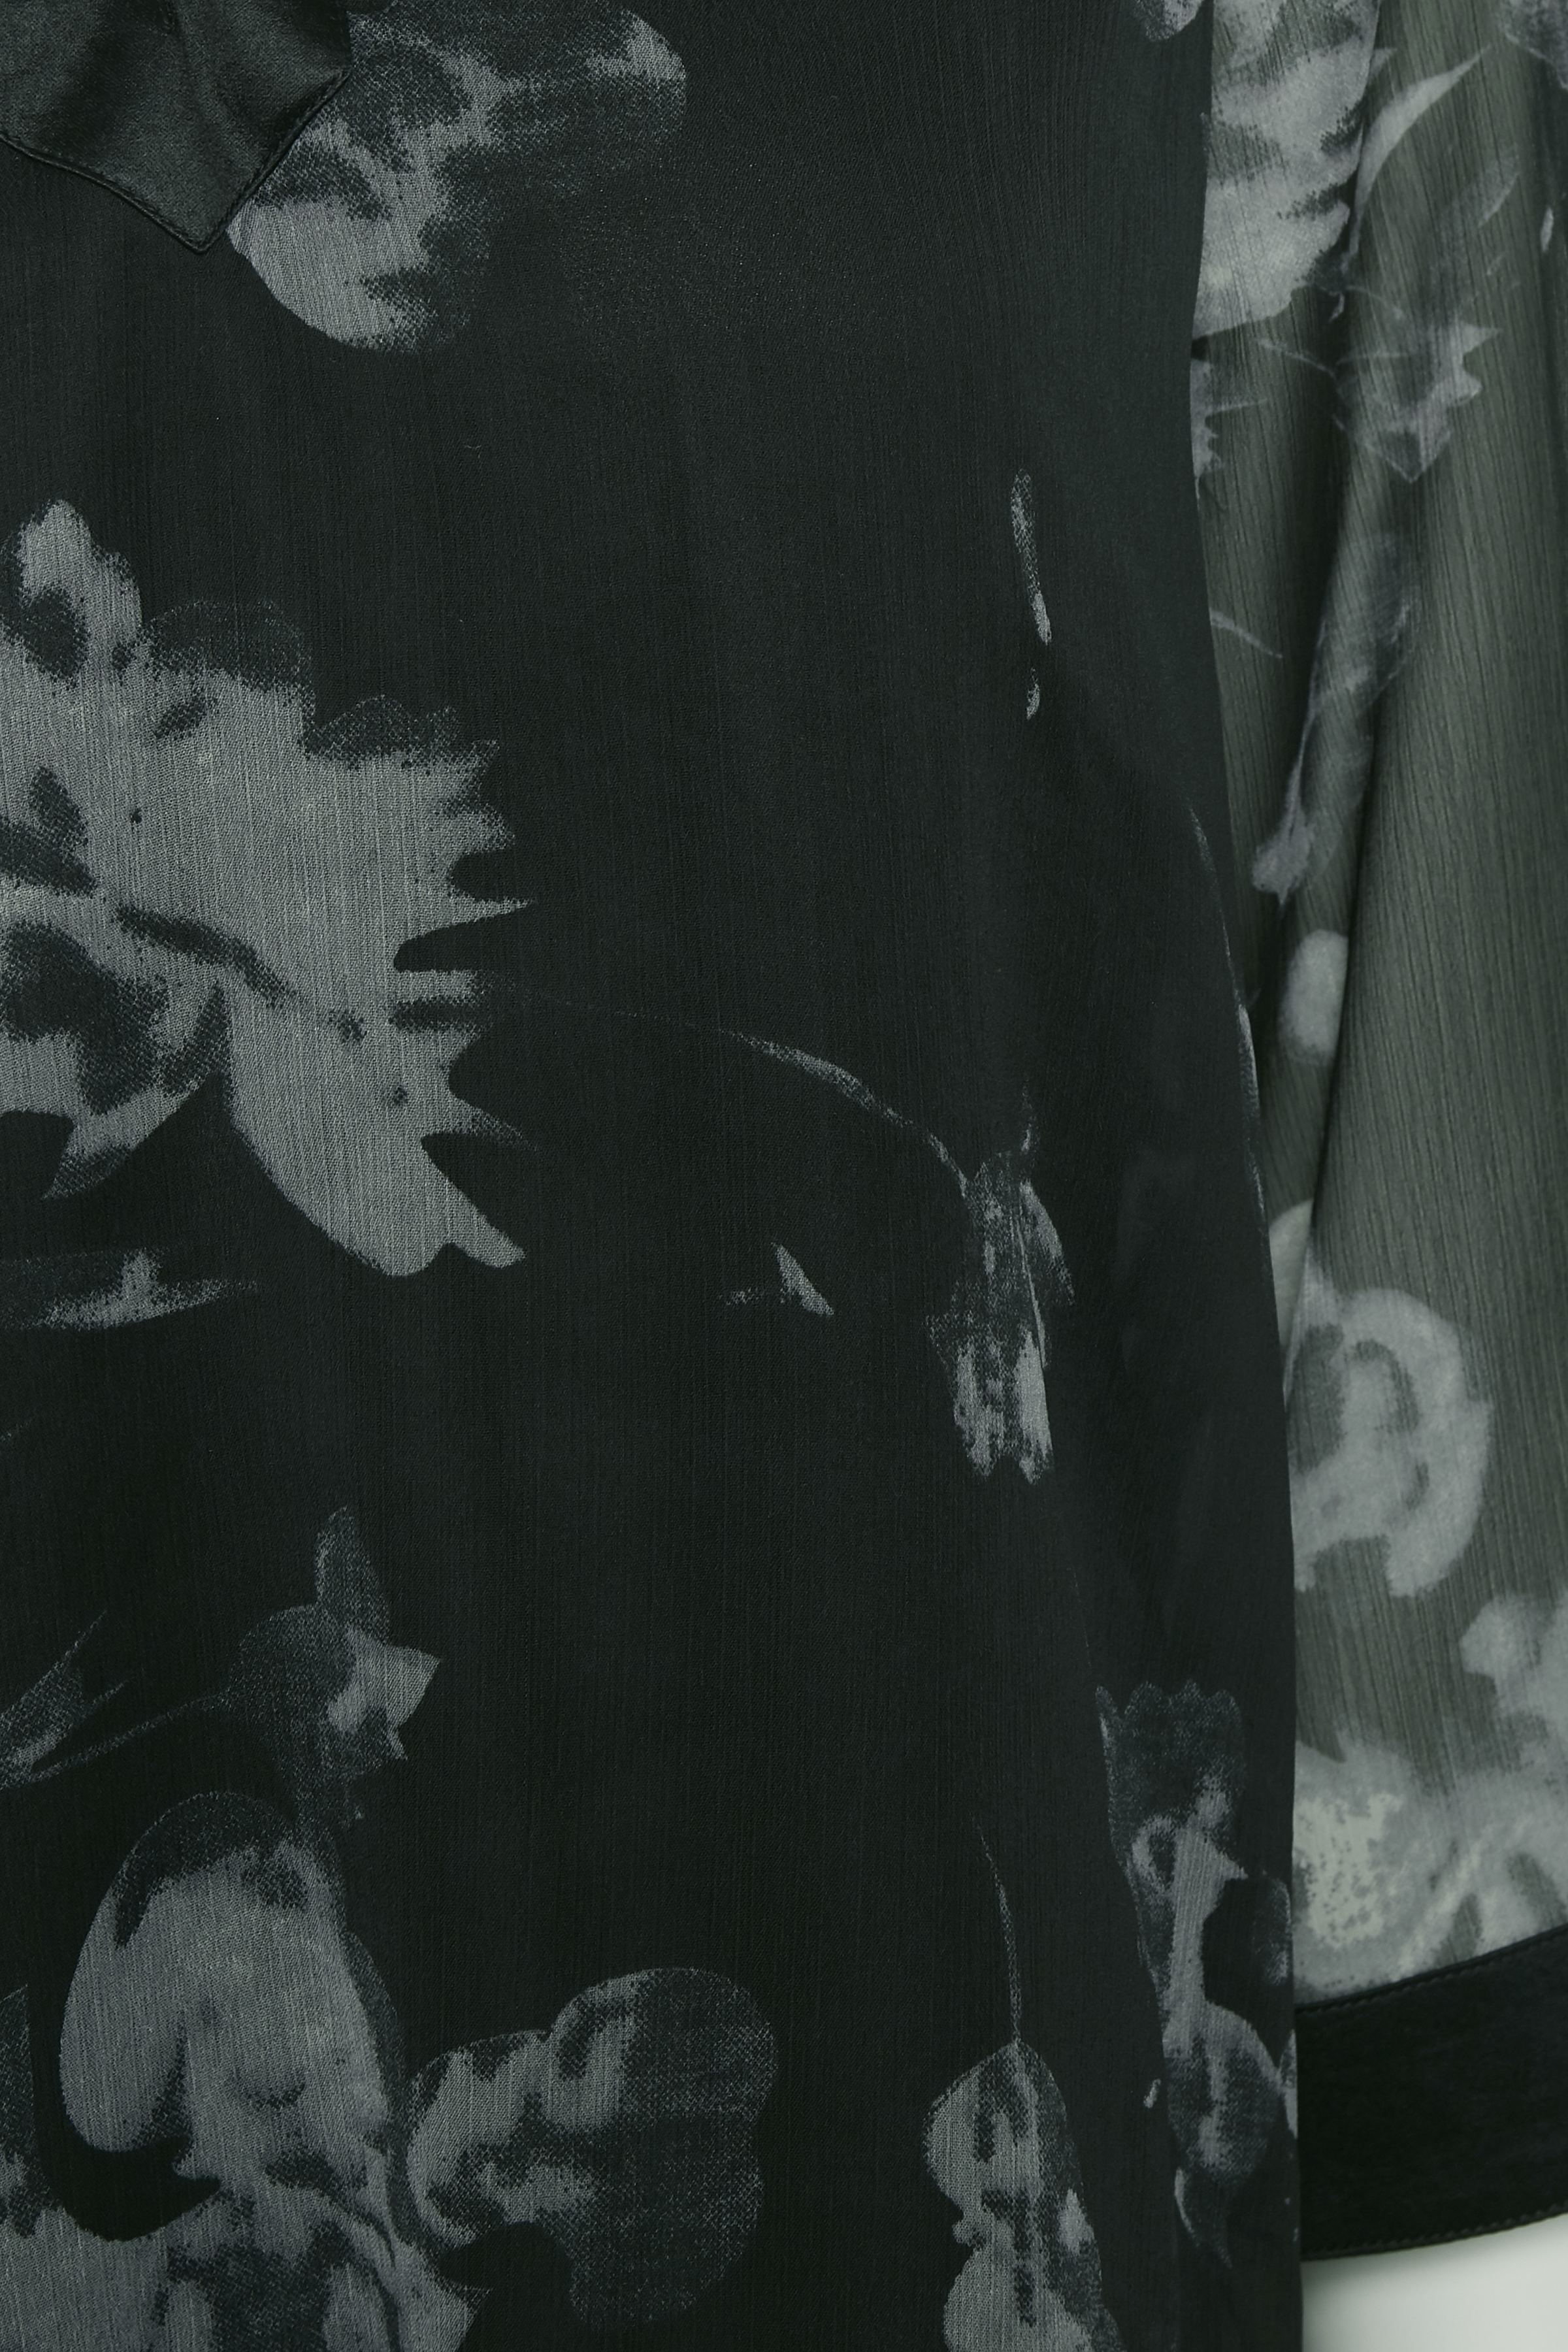 Svart/grå Långärmad blus från Bon'A Parte – Köp Svart/grå Långärmad blus från stl. S-2XL här